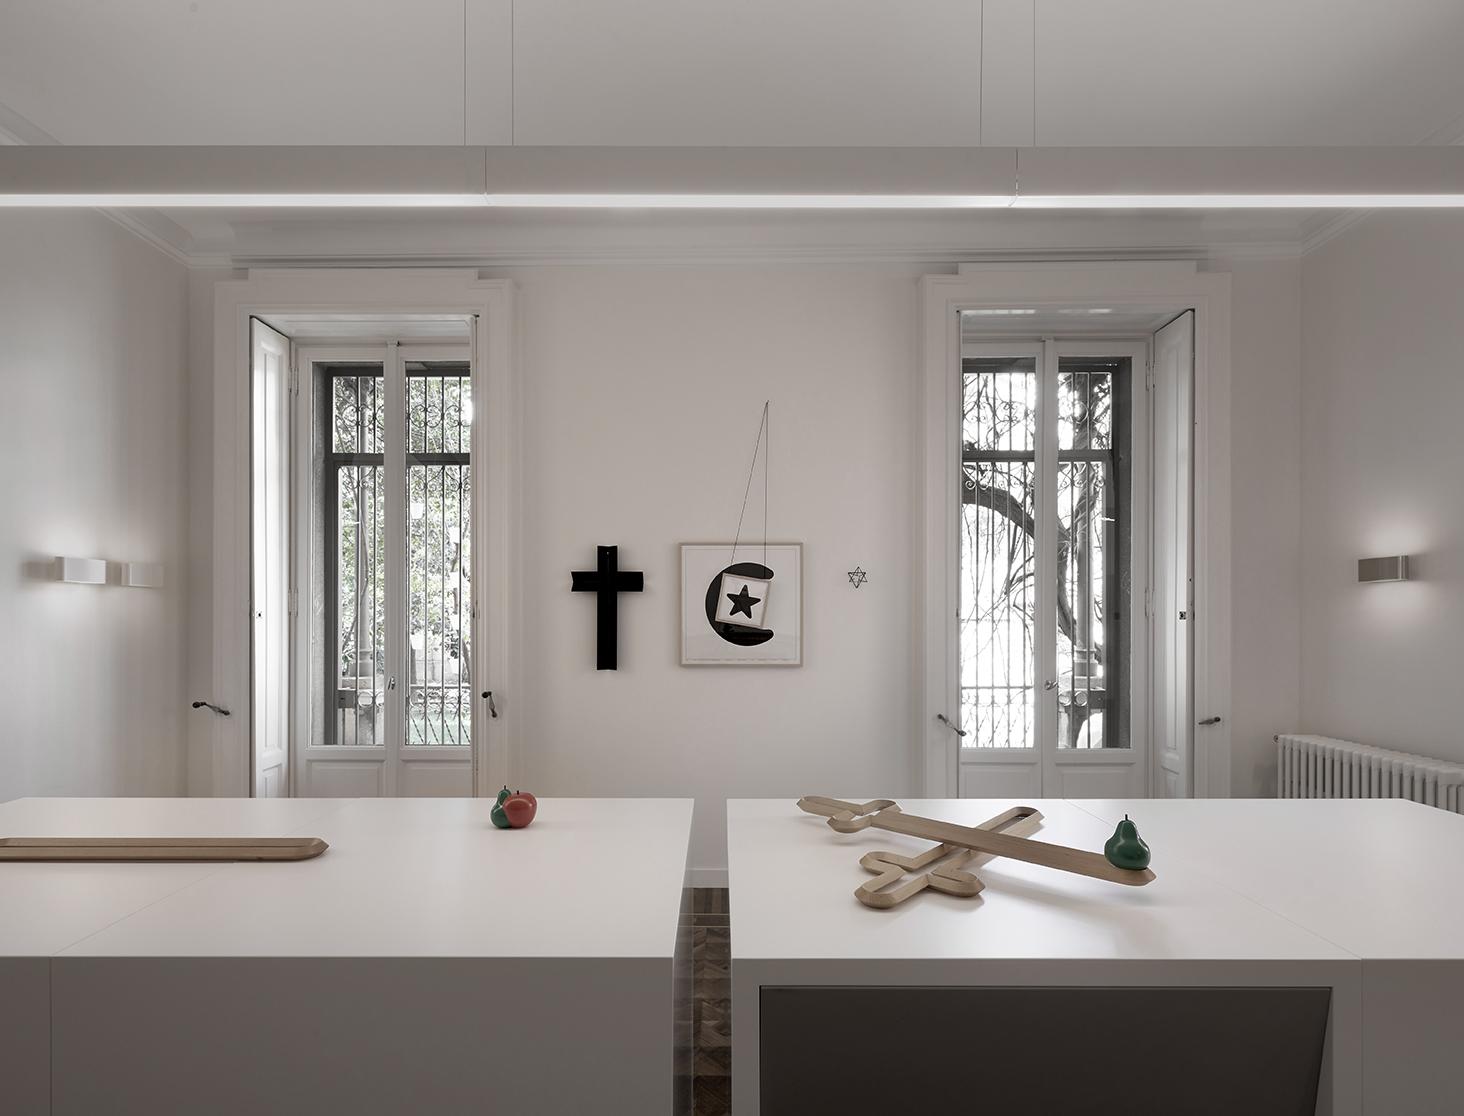 Ron Gilad. Fragments of life. Installation view, Milano 2017. Photo Miro Zagnoli